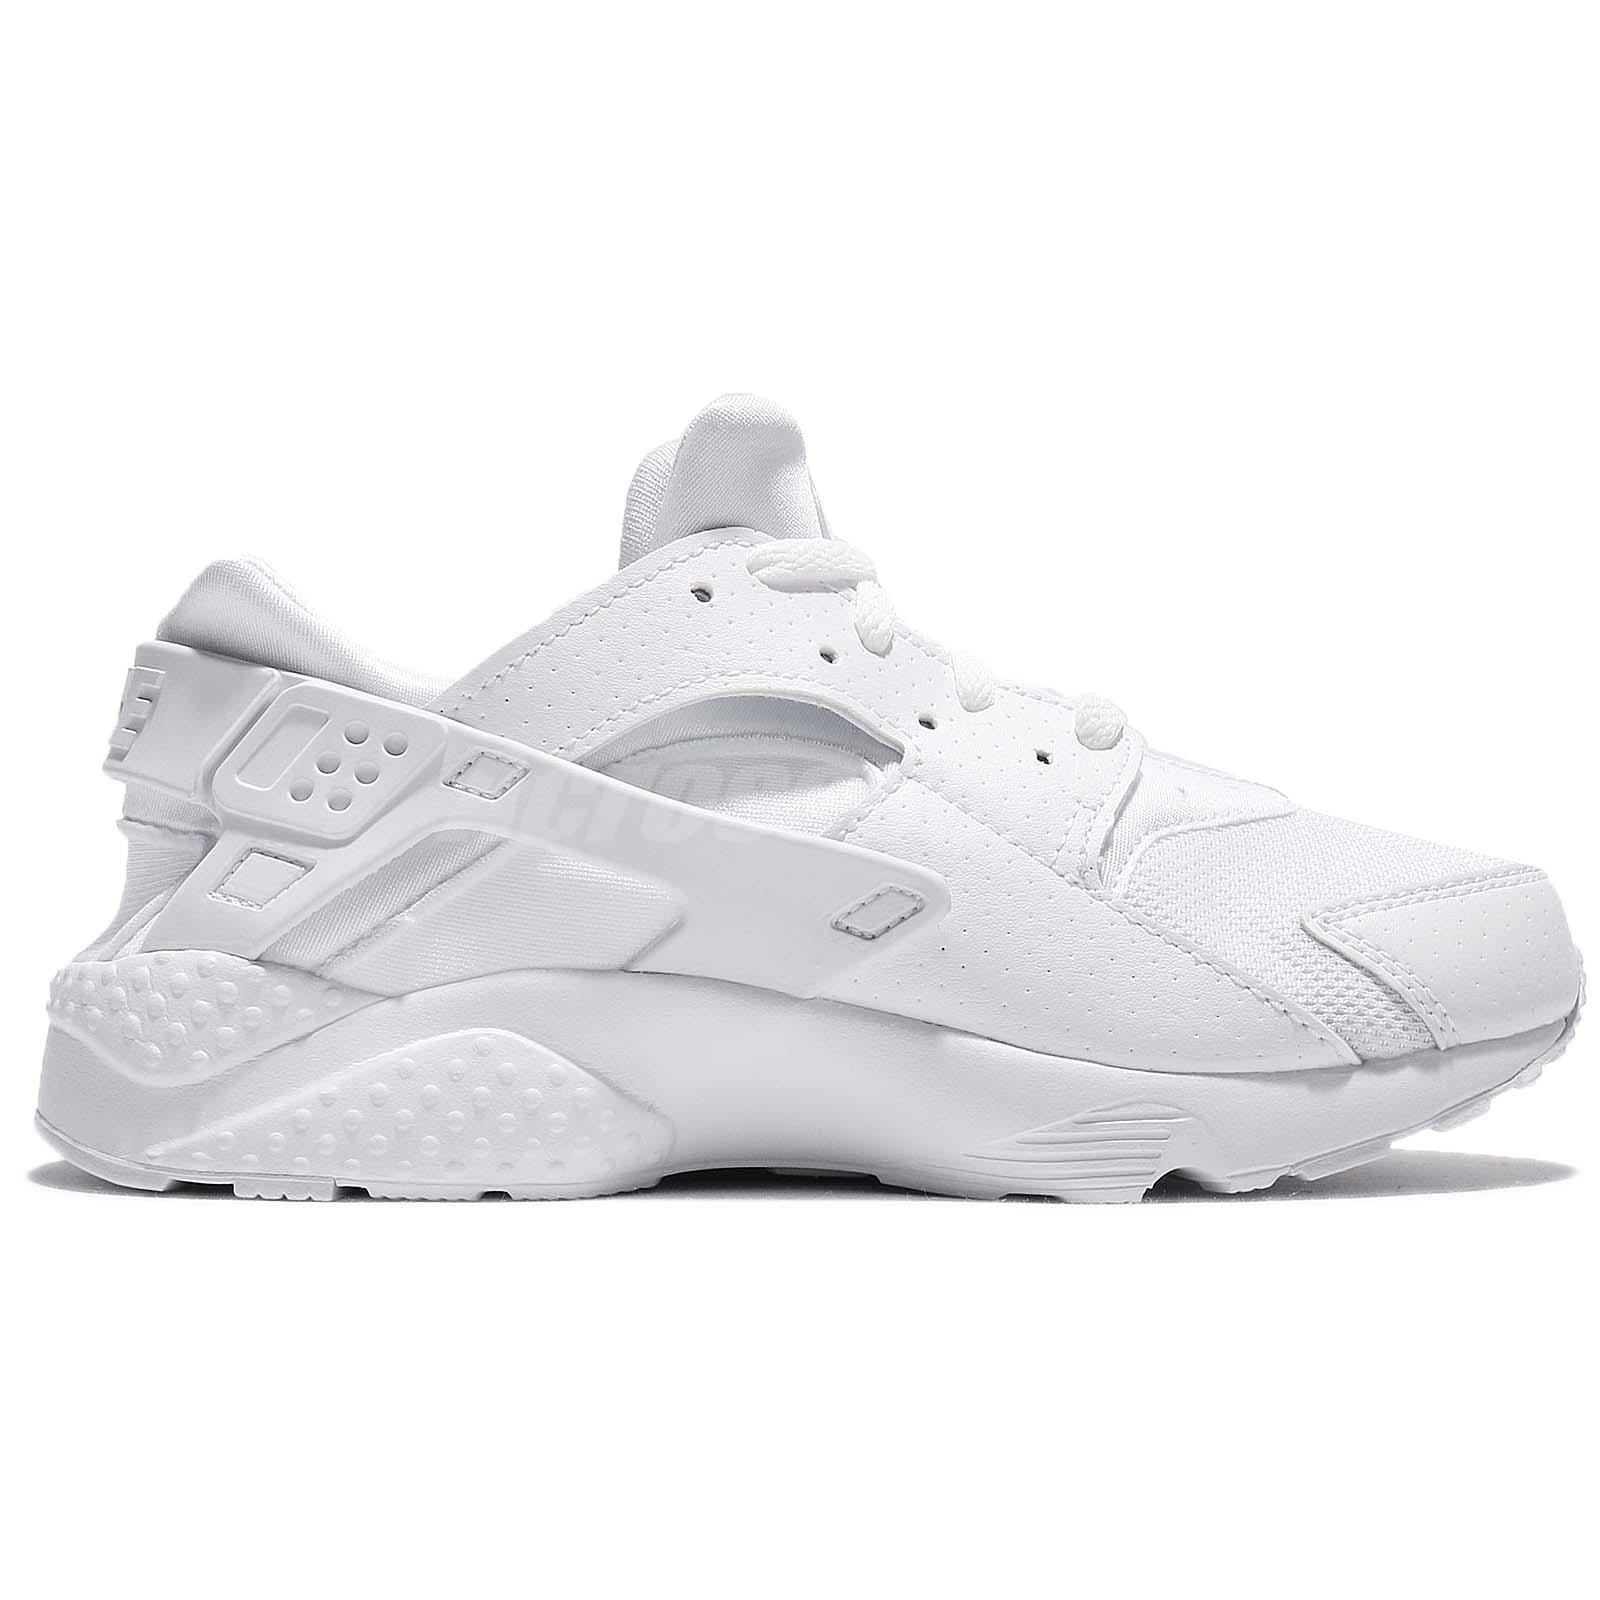 651e9593ac4a Nike Huarache Run PS White Pure Platinum Kid Preschool Shoes ...